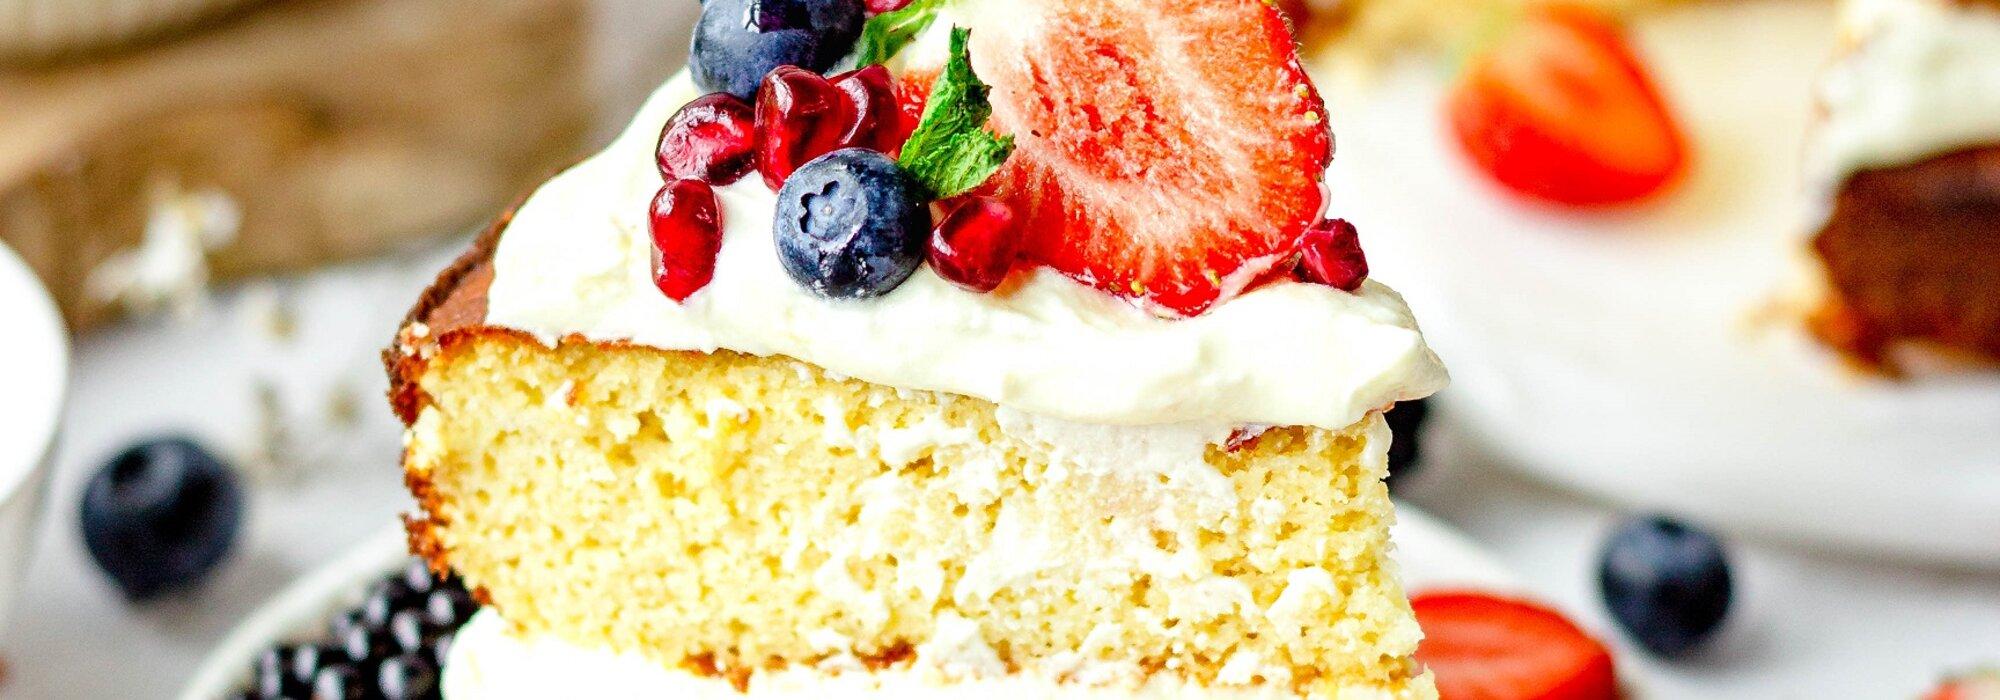 Glutenvrije en koolhydraatarme vanille cake